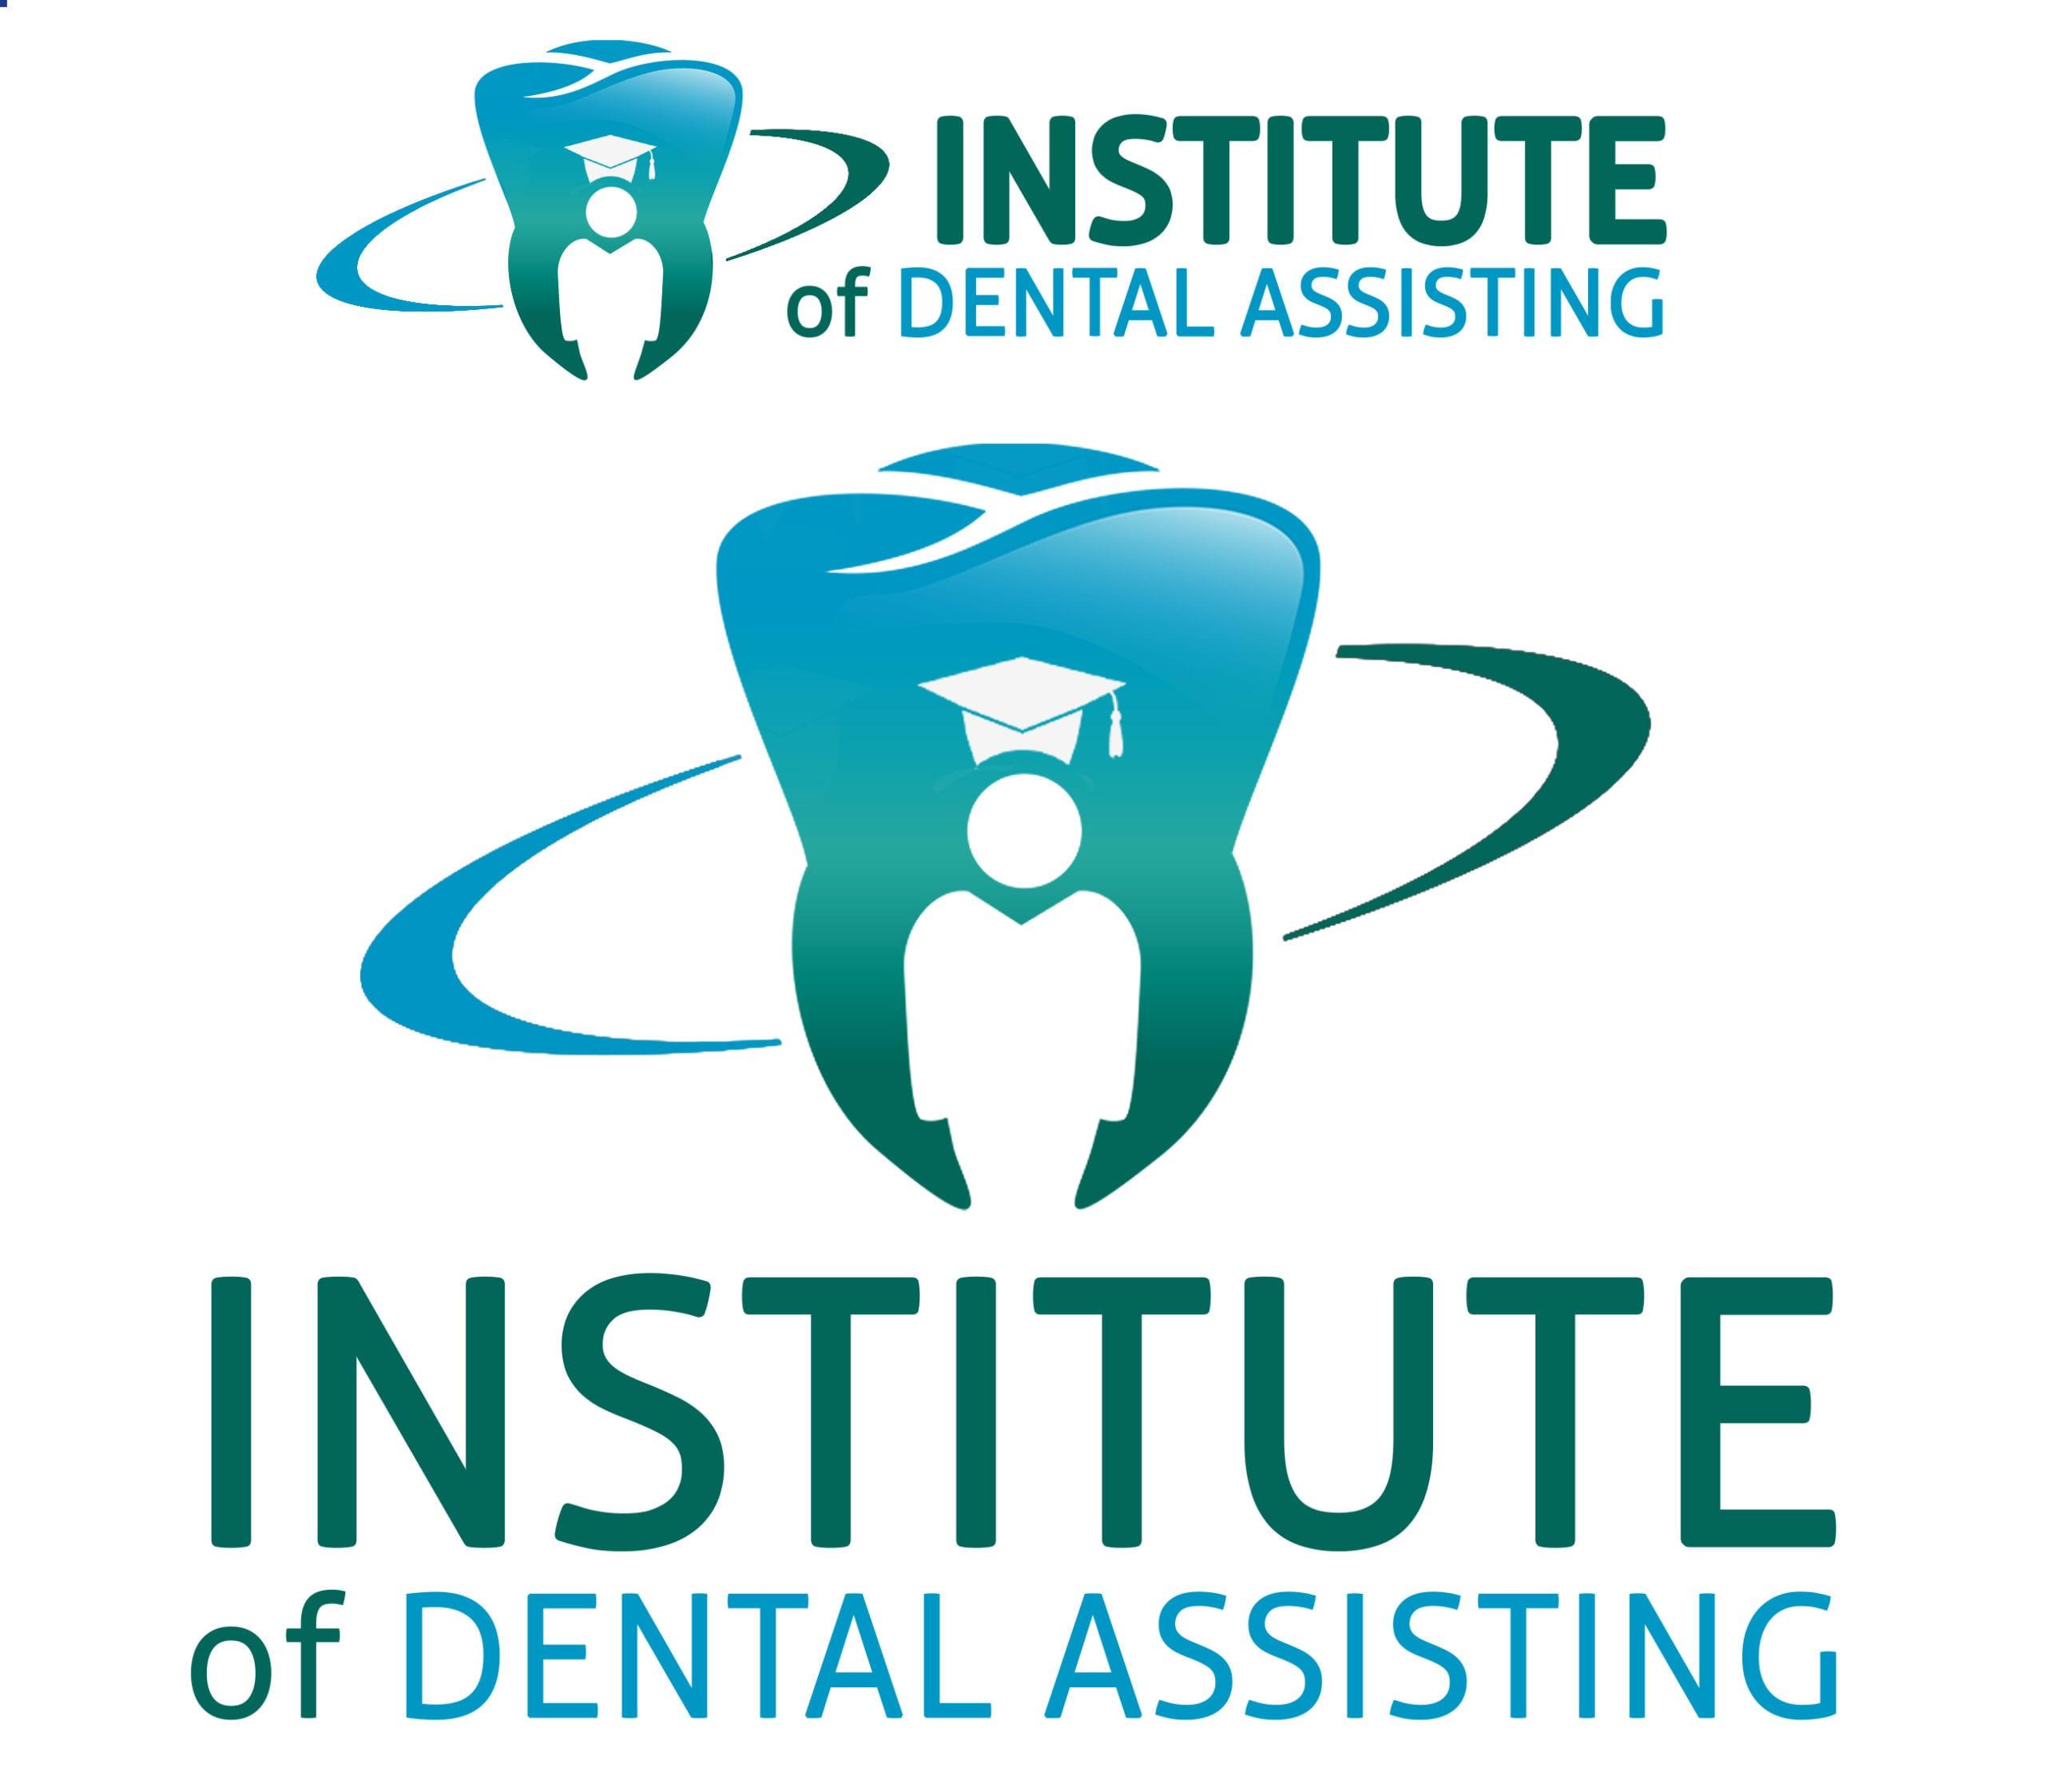 Institute-of-Dental-Assisting-Logo-012-Final